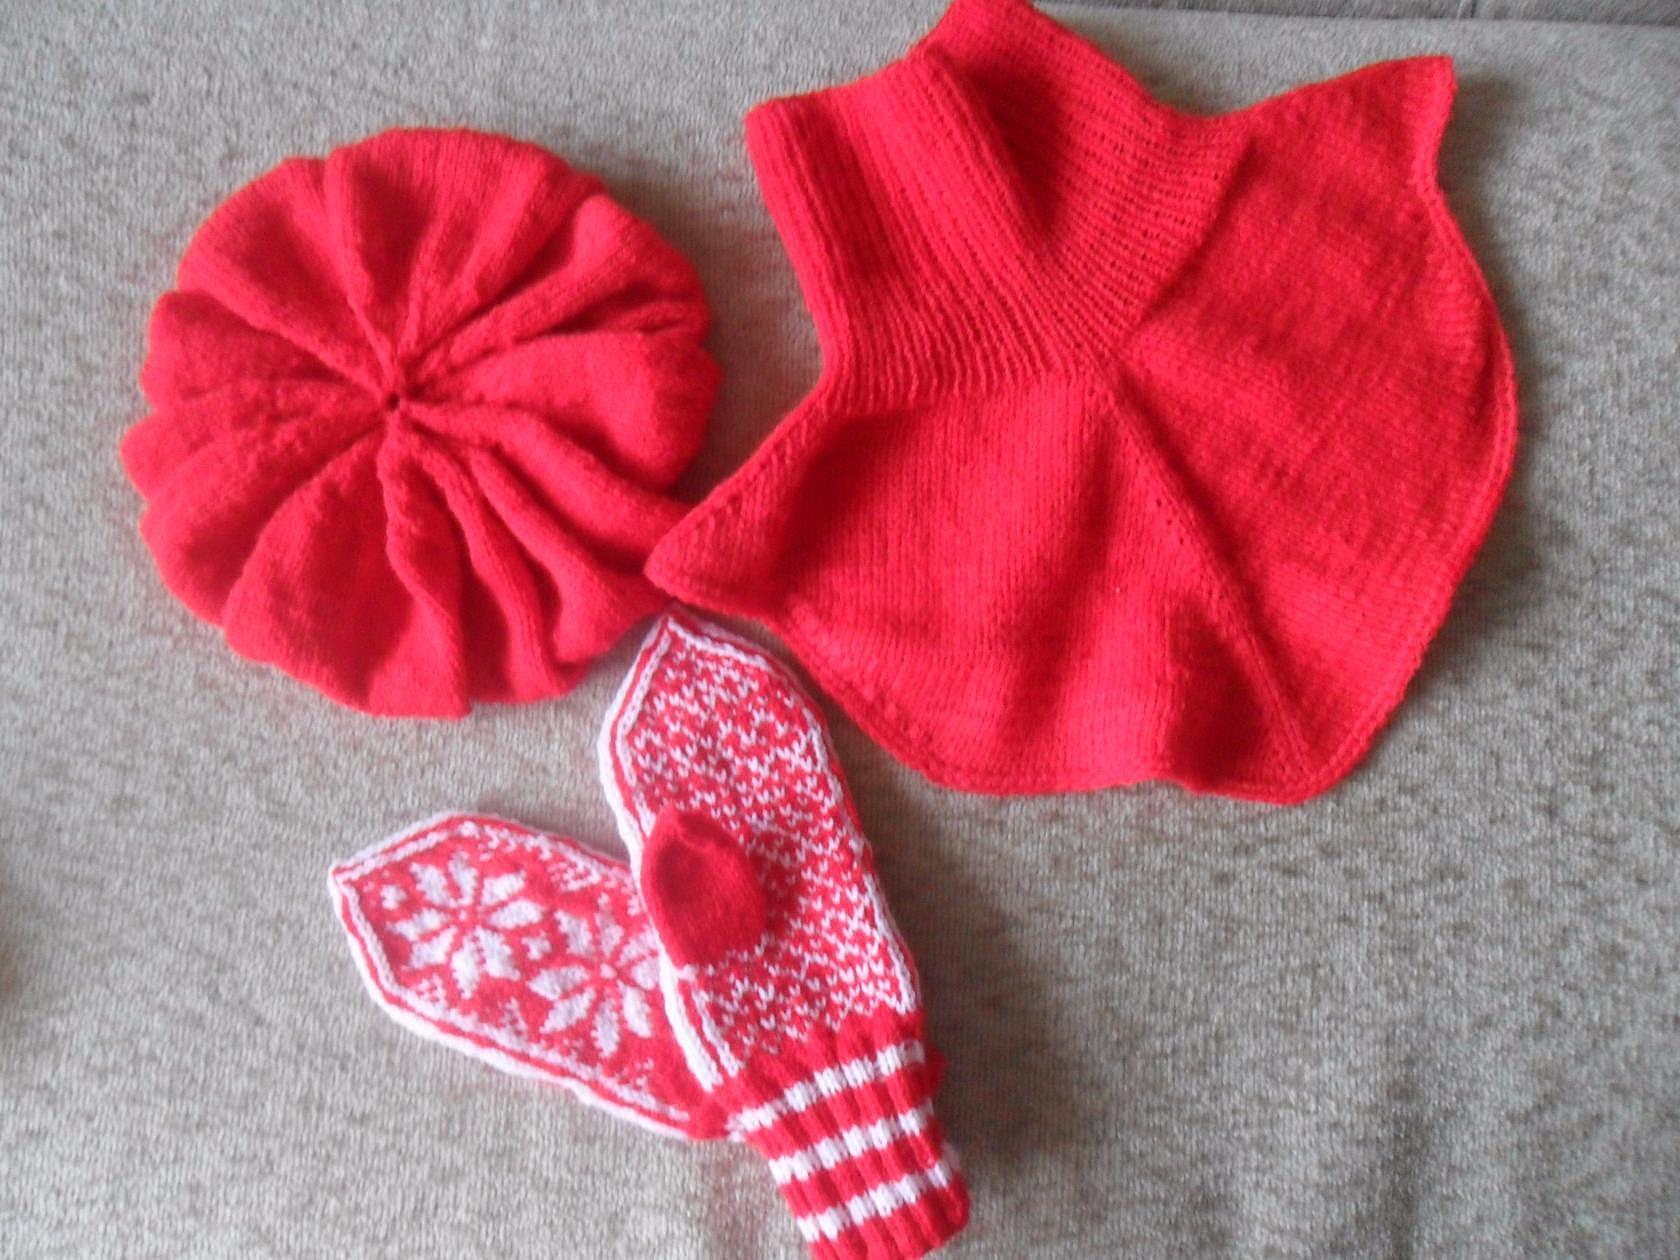 Манишка и рукавички сделано своими руками